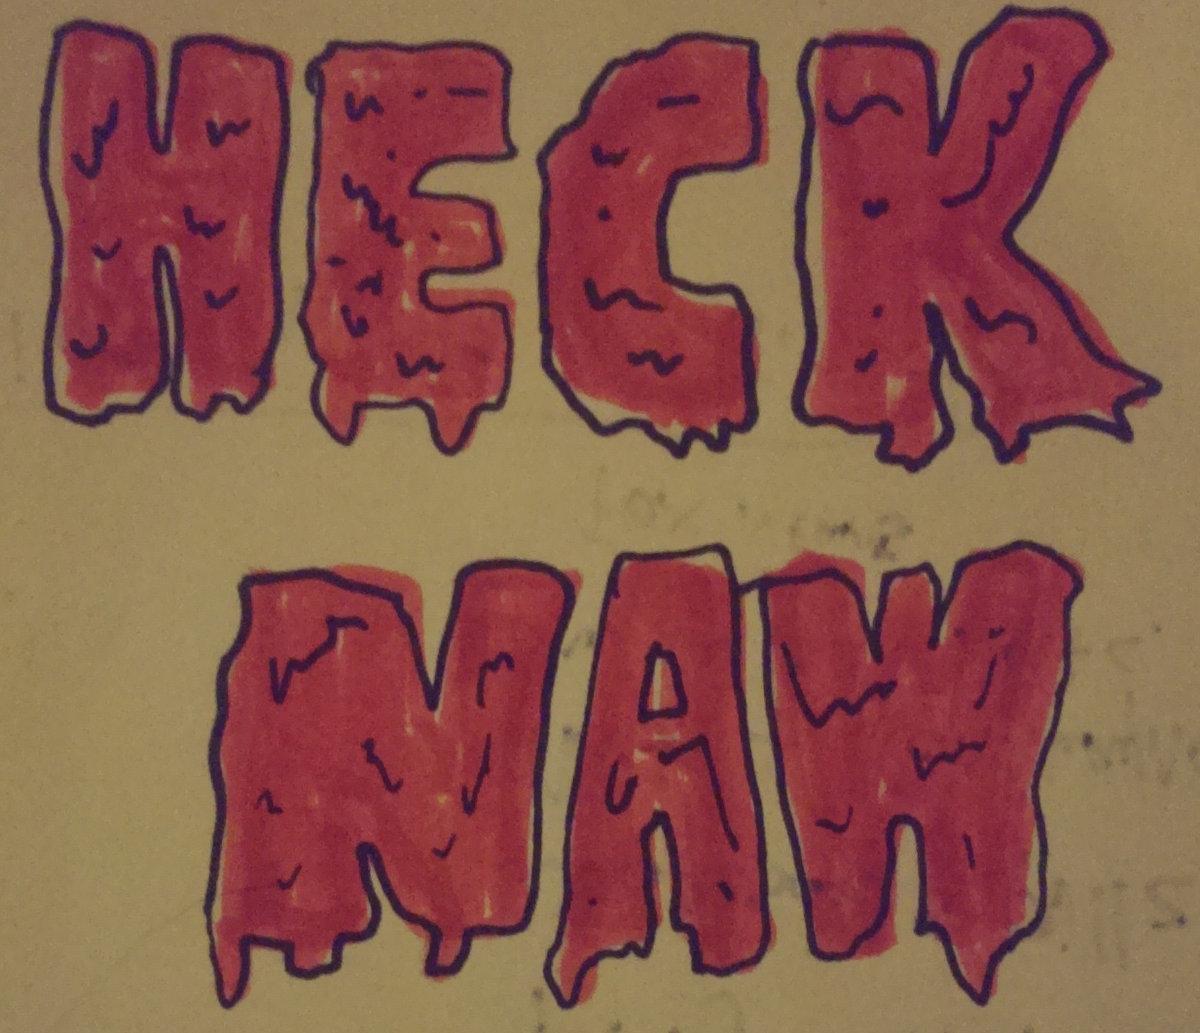 Heck Naw Heck Naw